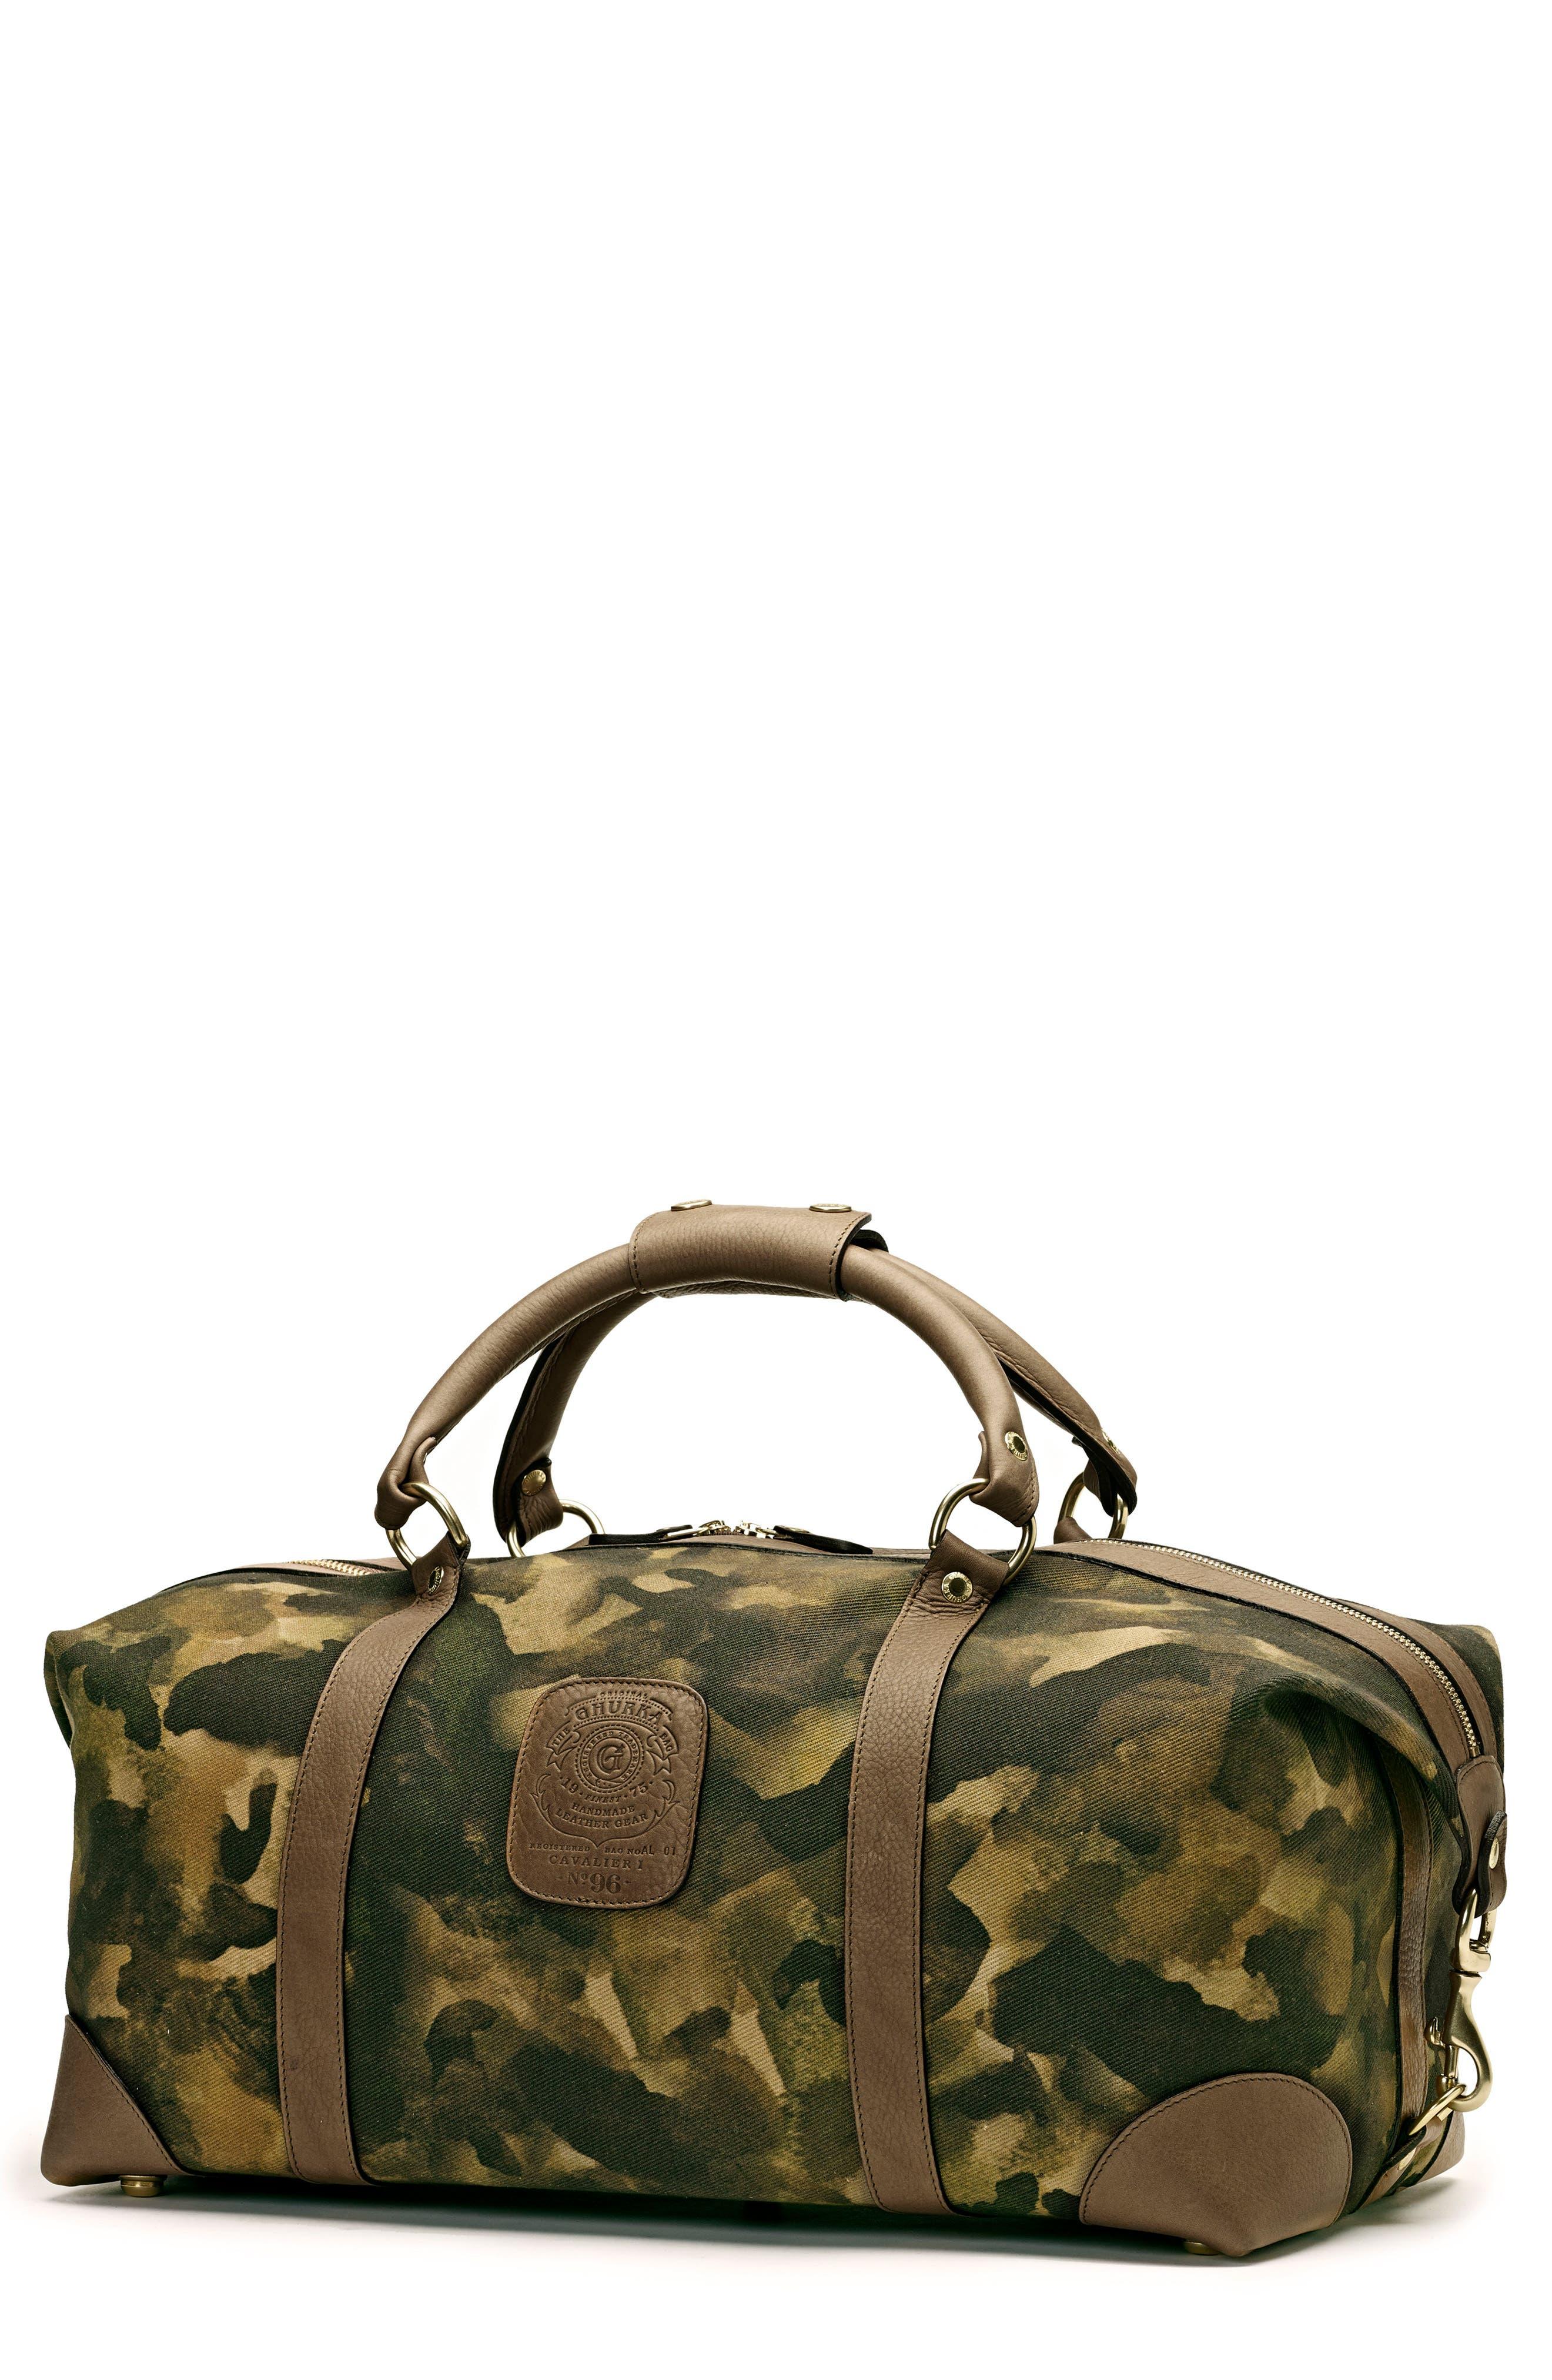 GHURKA Cavalier I Duffel Bag